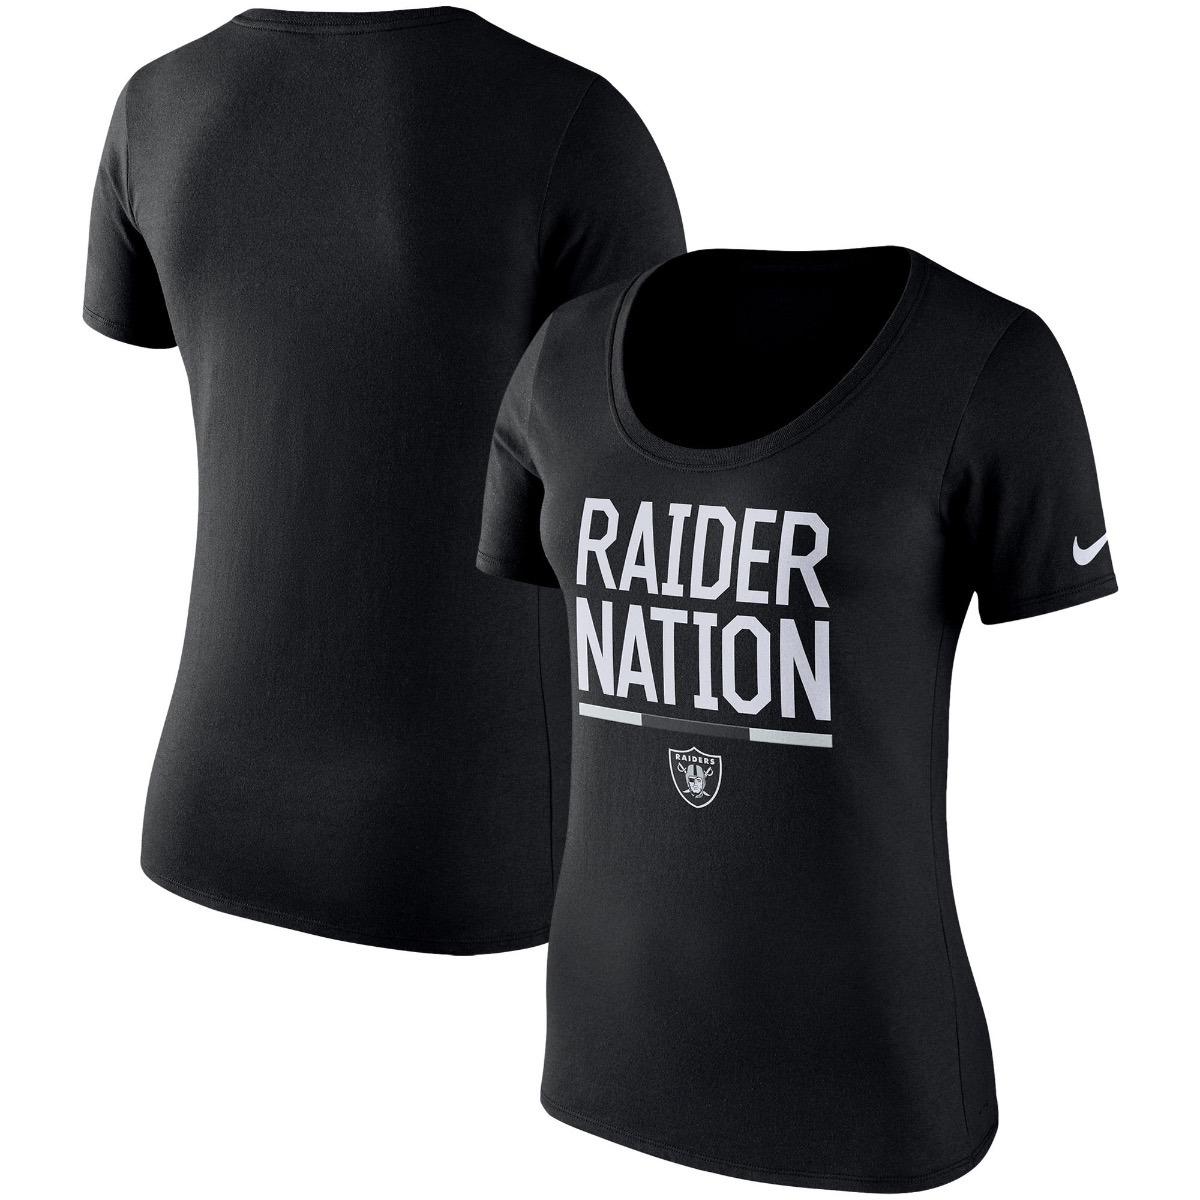 Playera Mujer Nike Nfl Oakland Raiders Carr Lynch -   699.00 en ... 7c508c39650